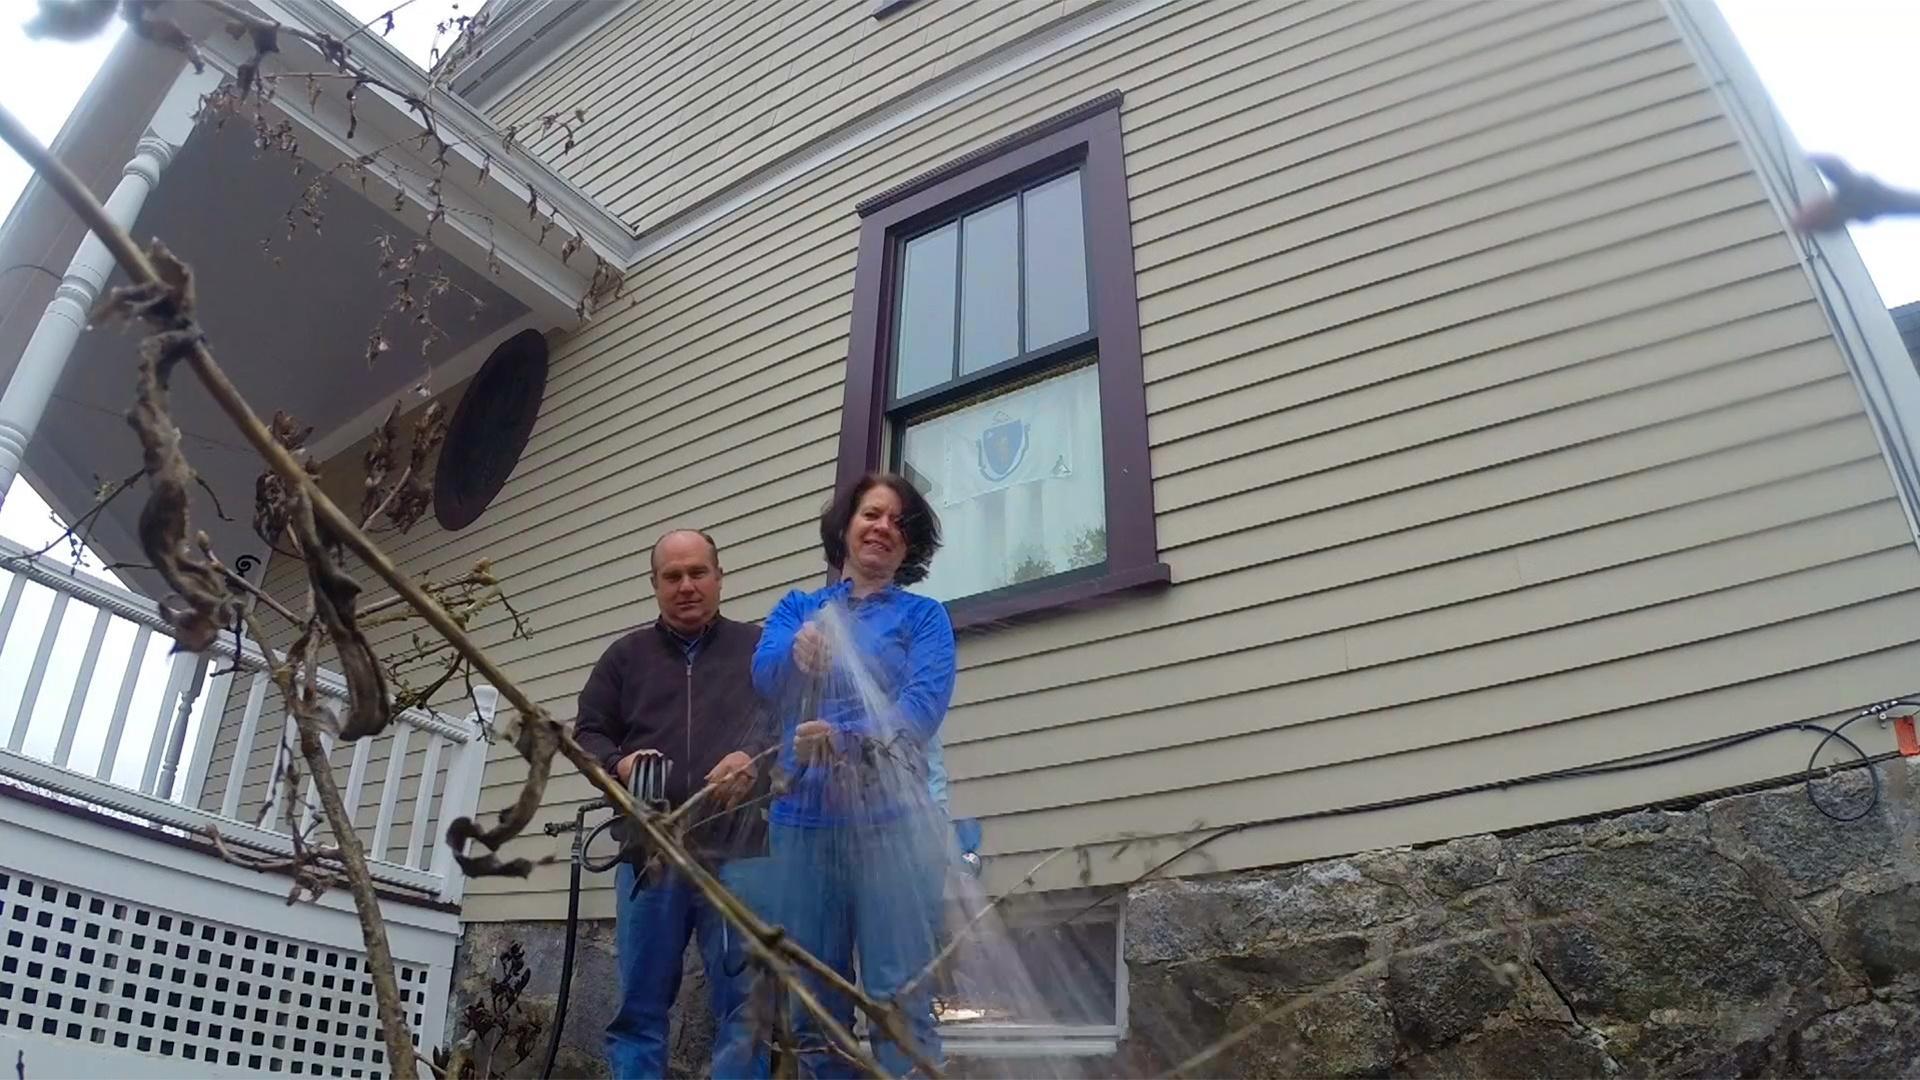 Ask This Old House | Hidden Door, Hydrant